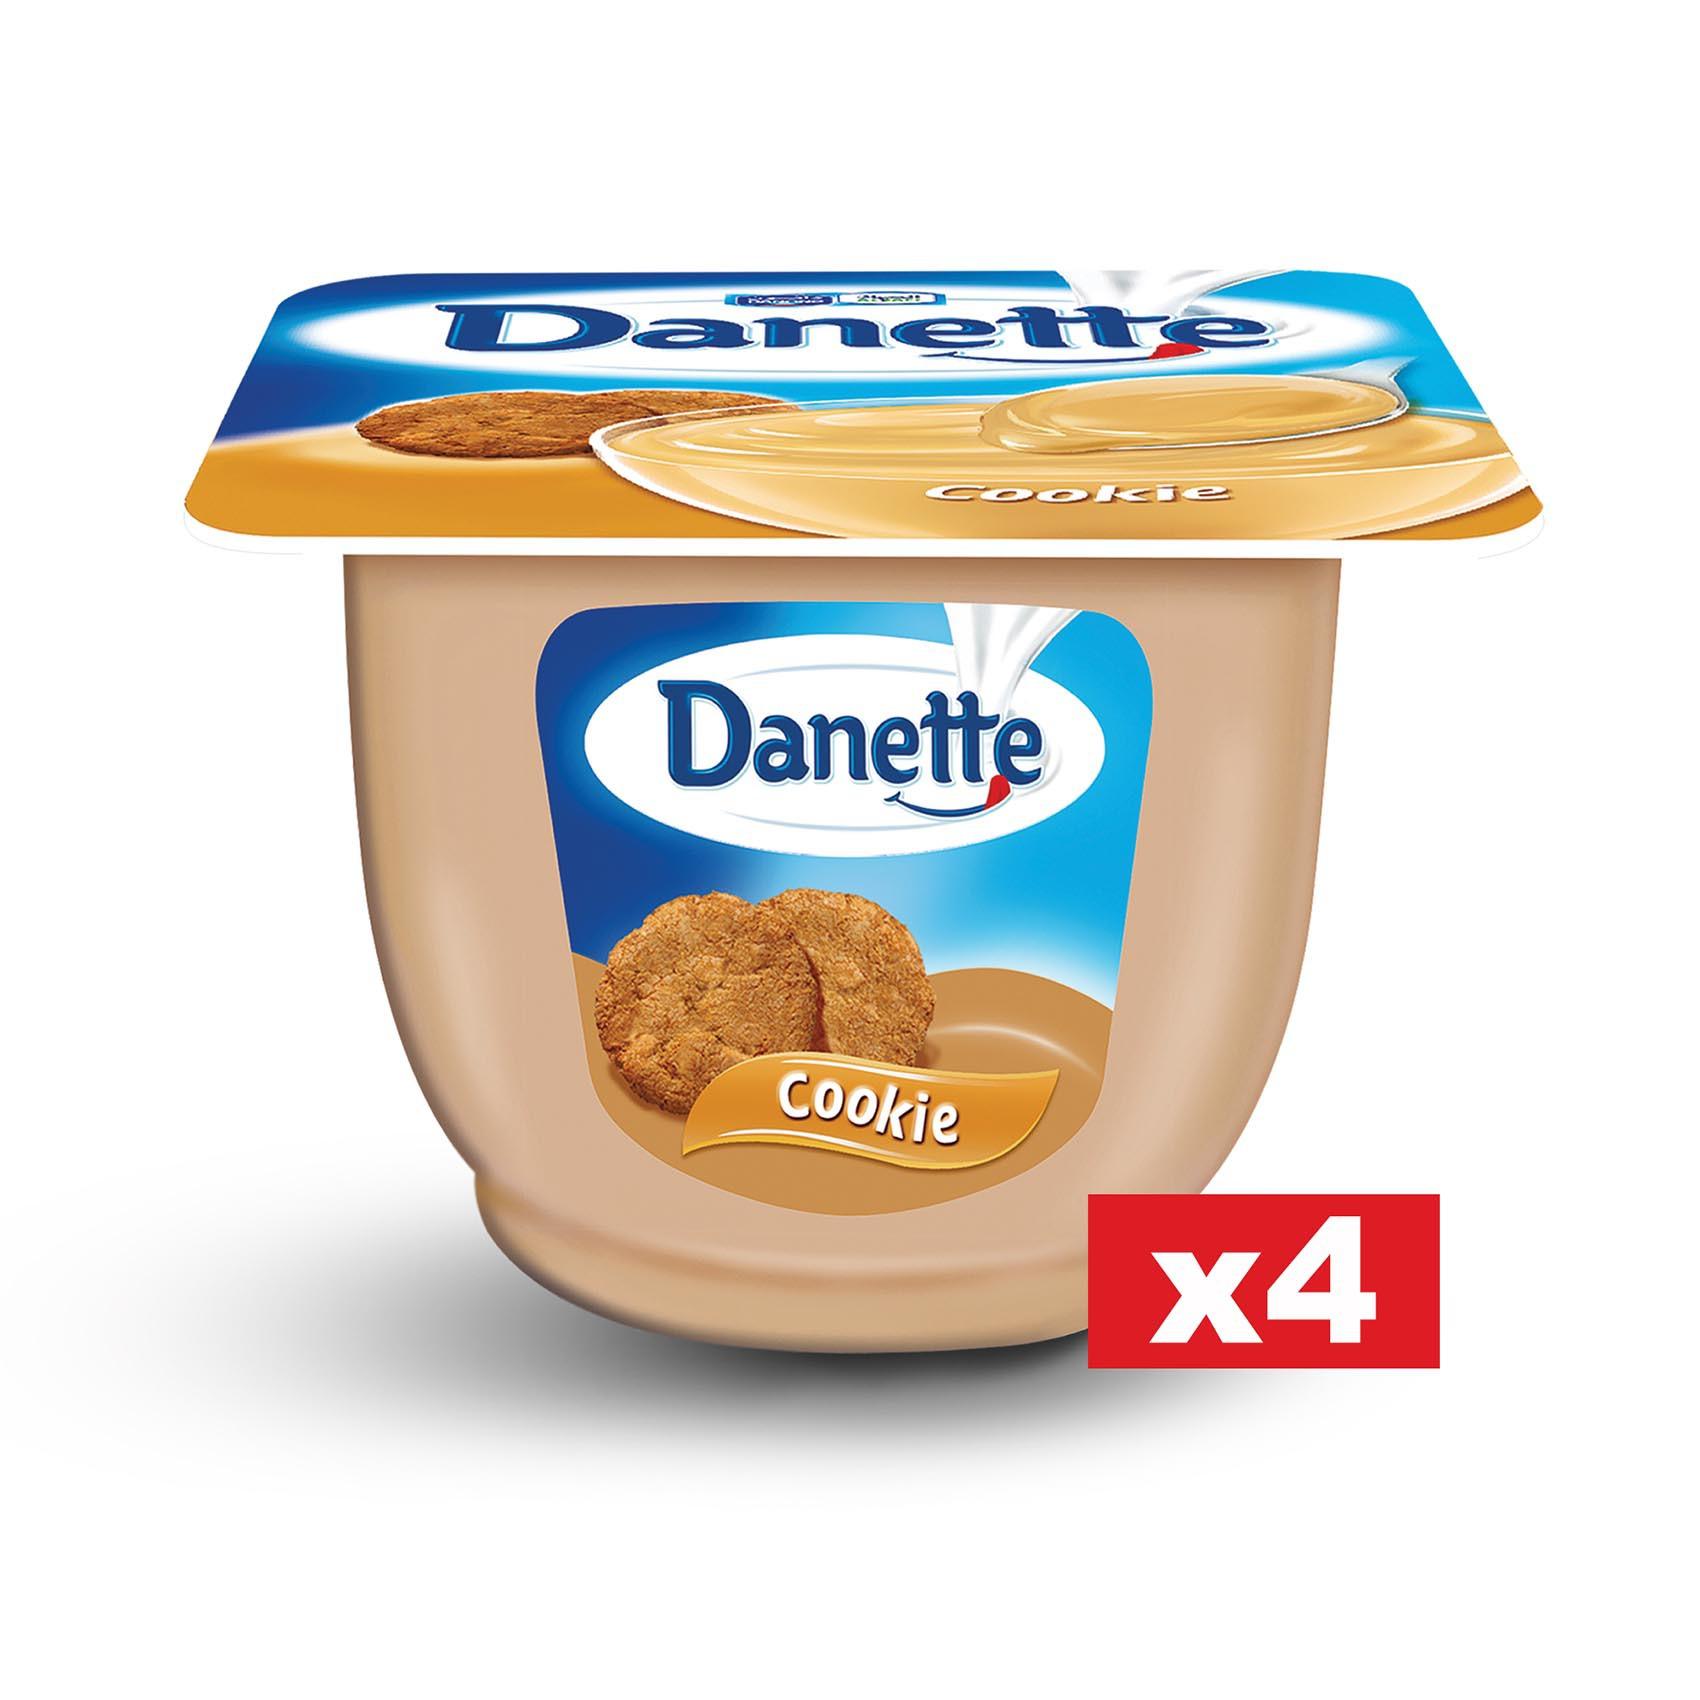 DANETTE CREAM DESSERT COOKIES 90GX4